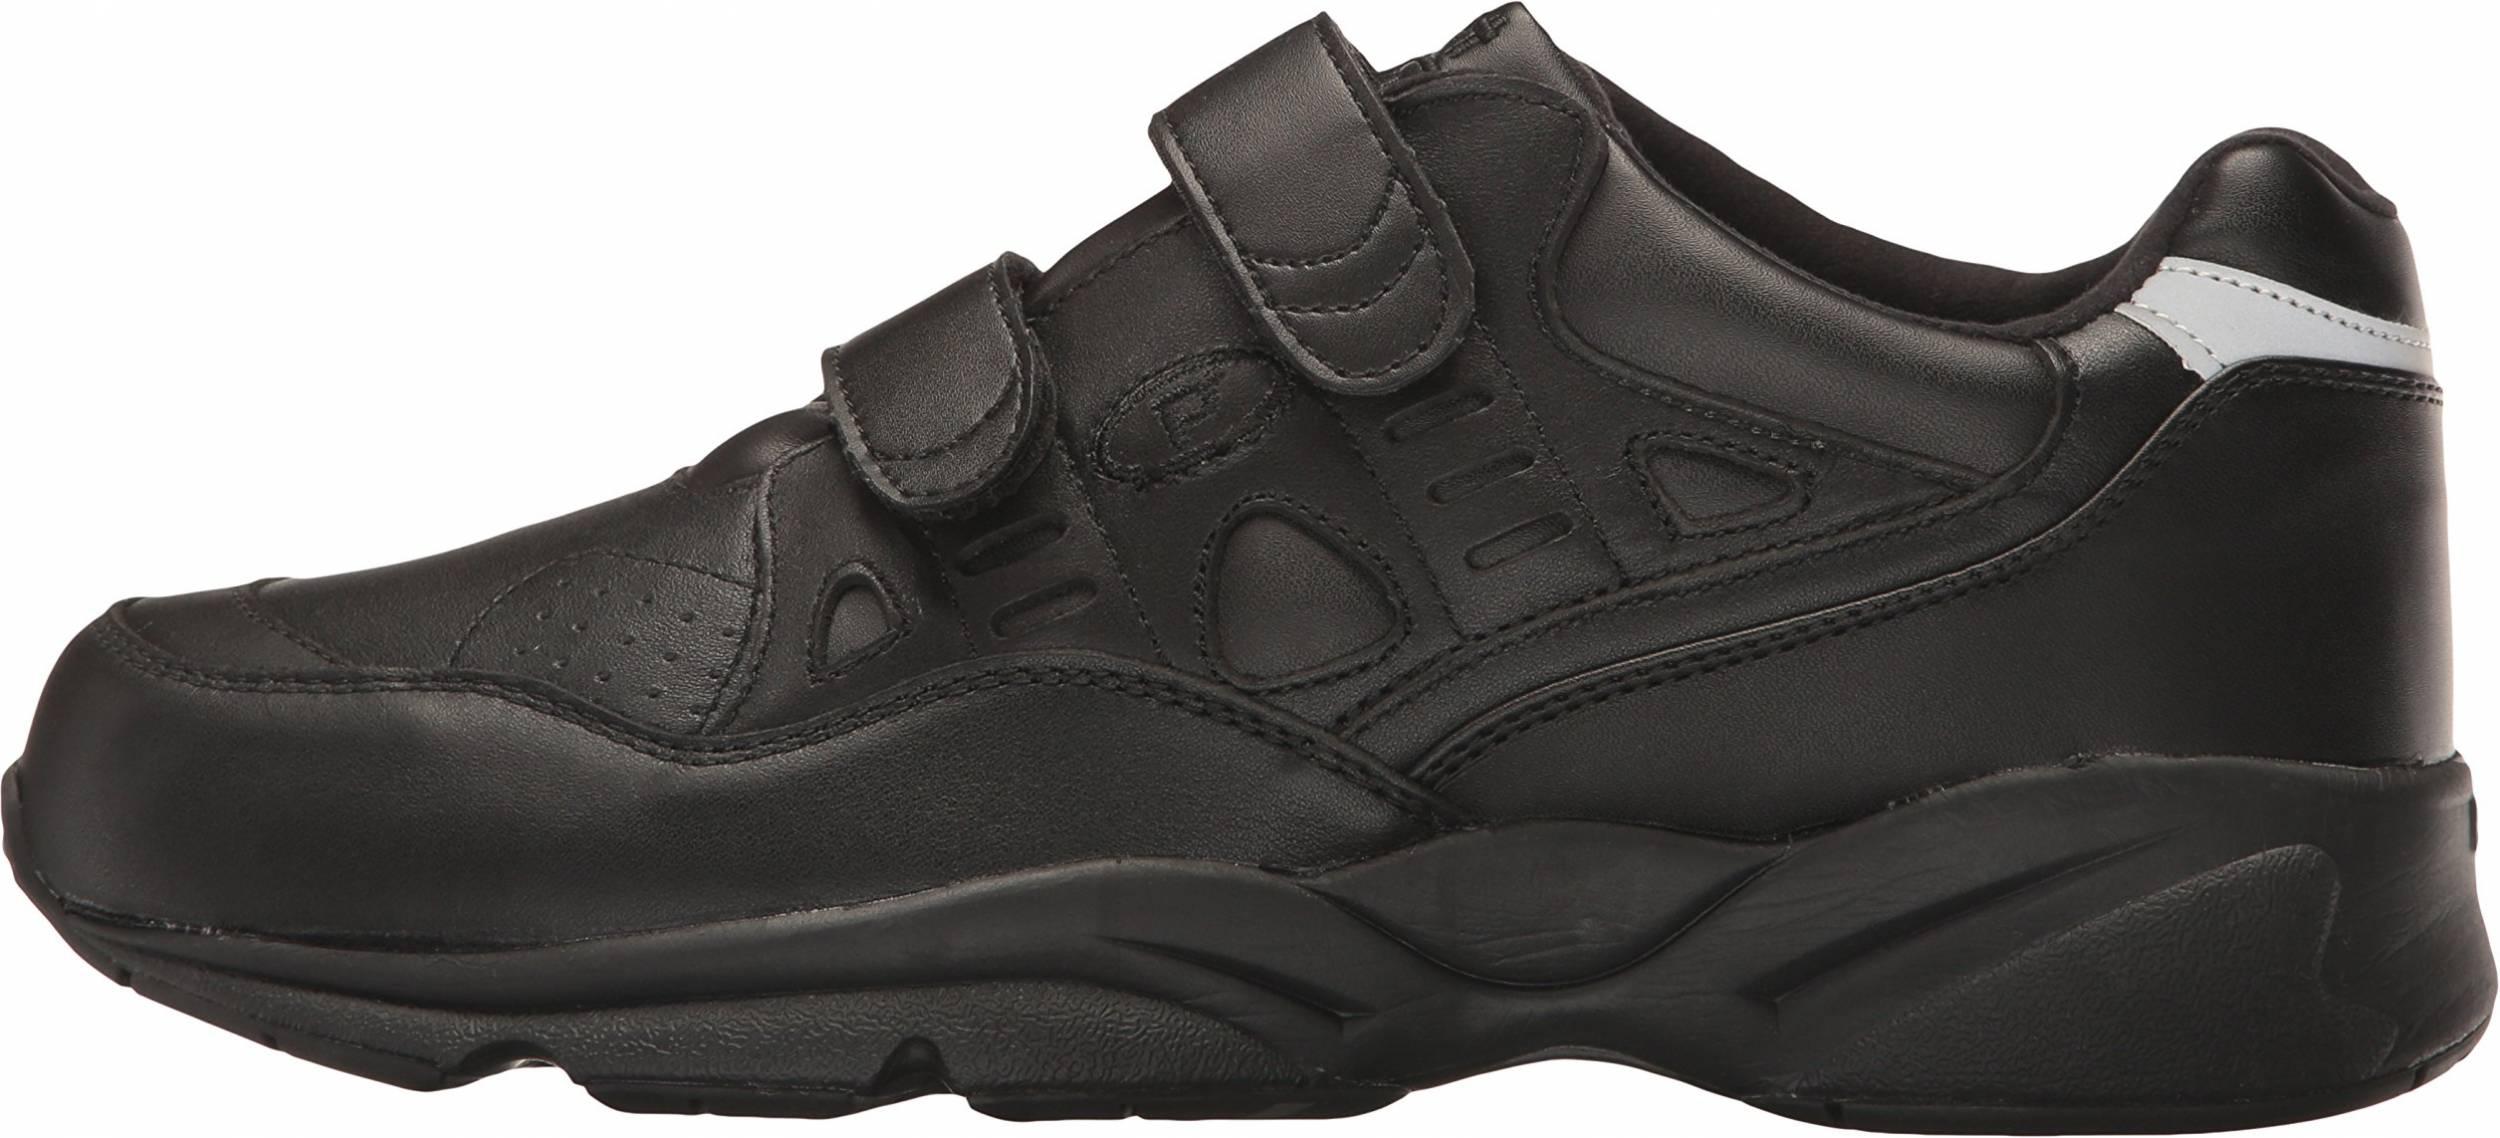 Propet Walking Shoes (15 Models in